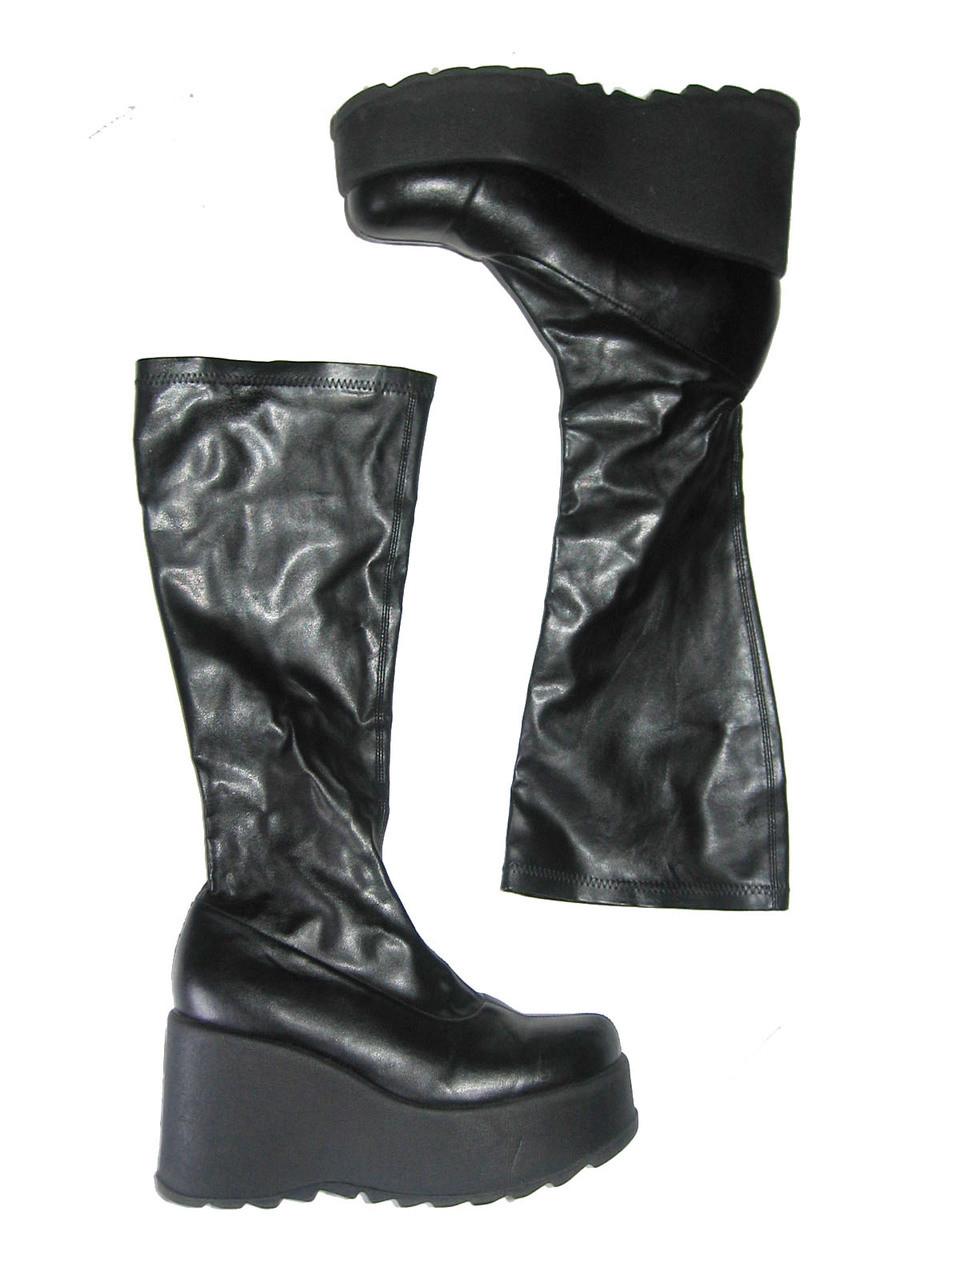 9dbe2bbdf49 Vintage Steve Madden Duke Black Chunky High Heel Platform Wedge ...